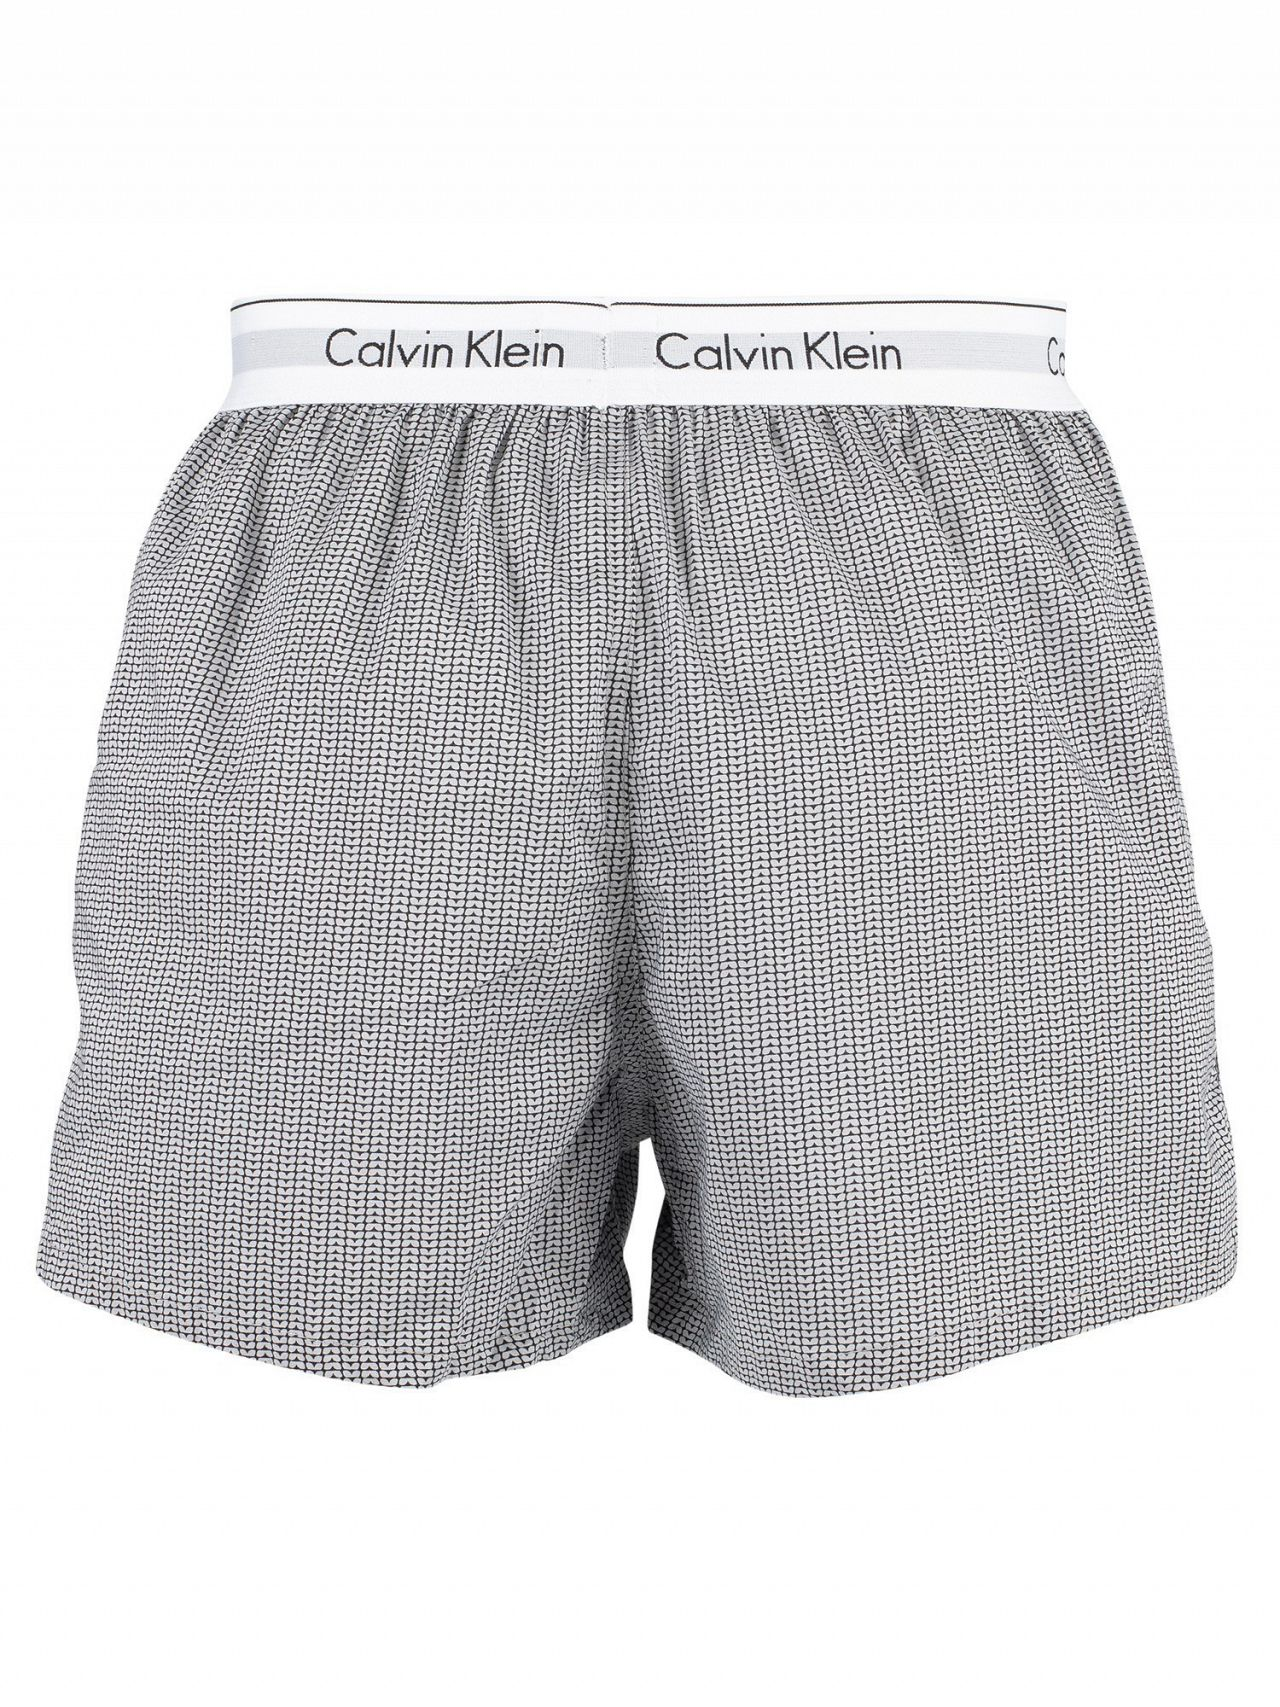 a18b81d2 Calvin Klein Stan Plaid/Grey 2 Pack Modern Cotton Stretch Woven Trunks